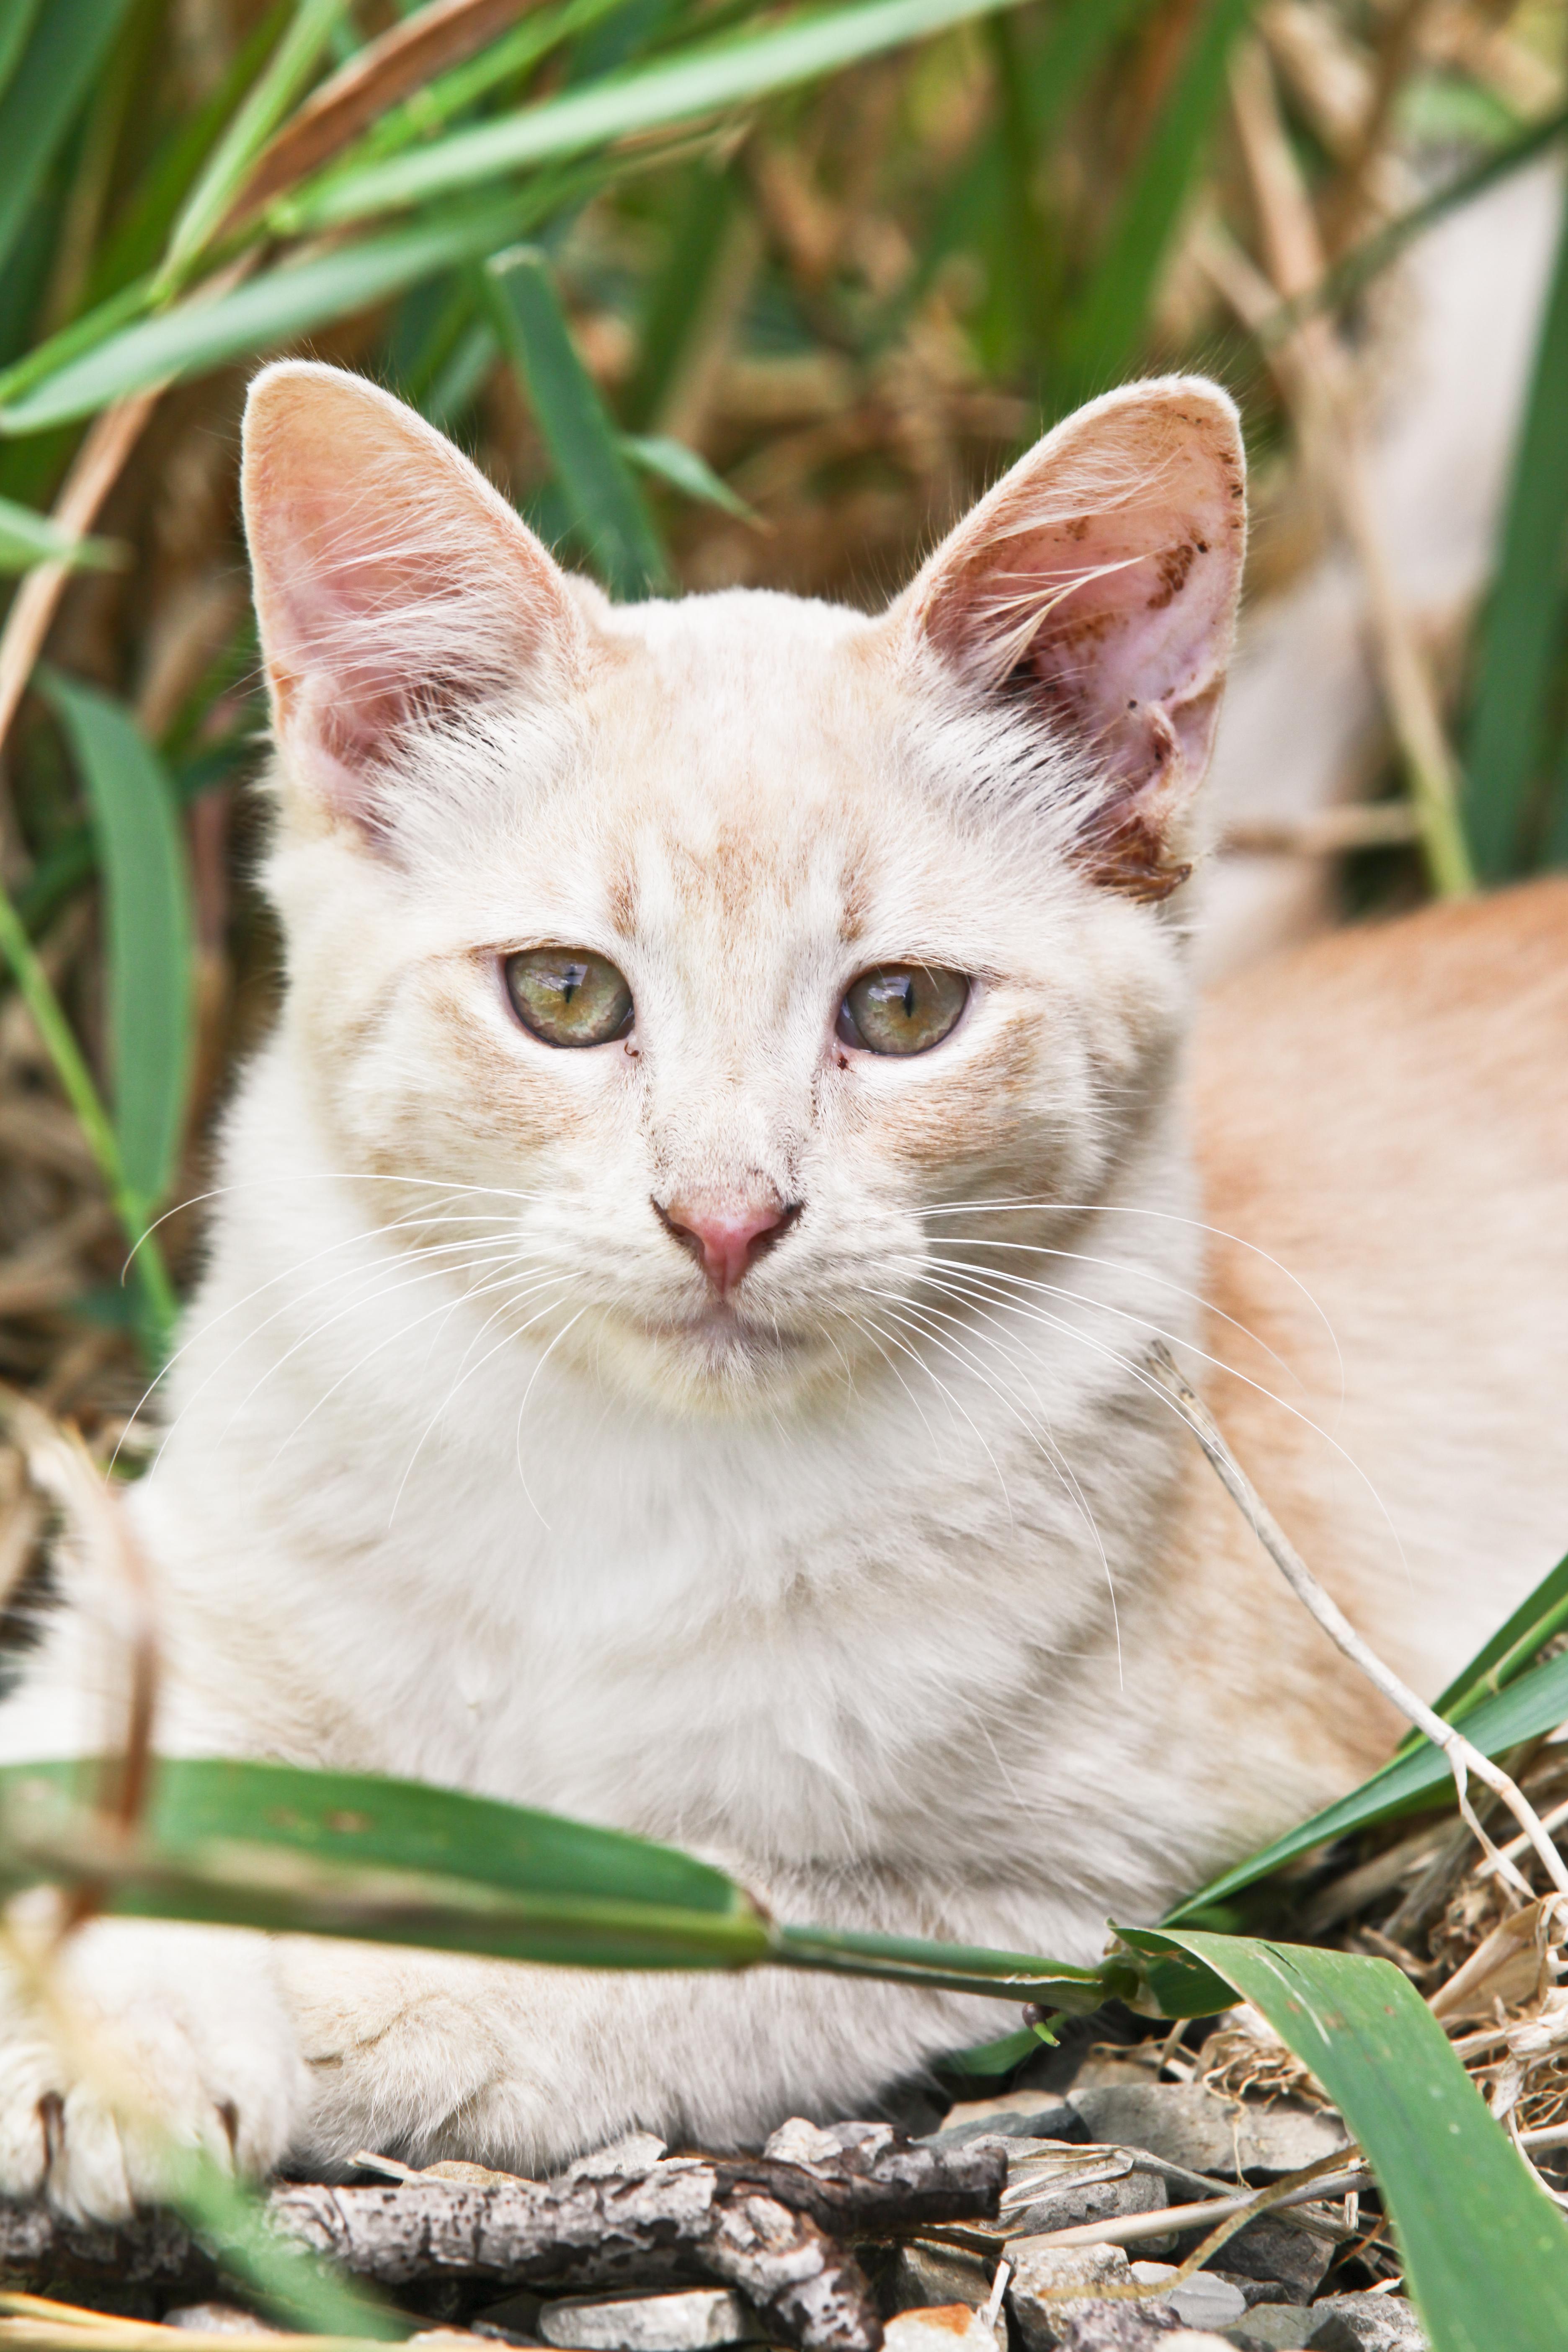 Cats-5098-2